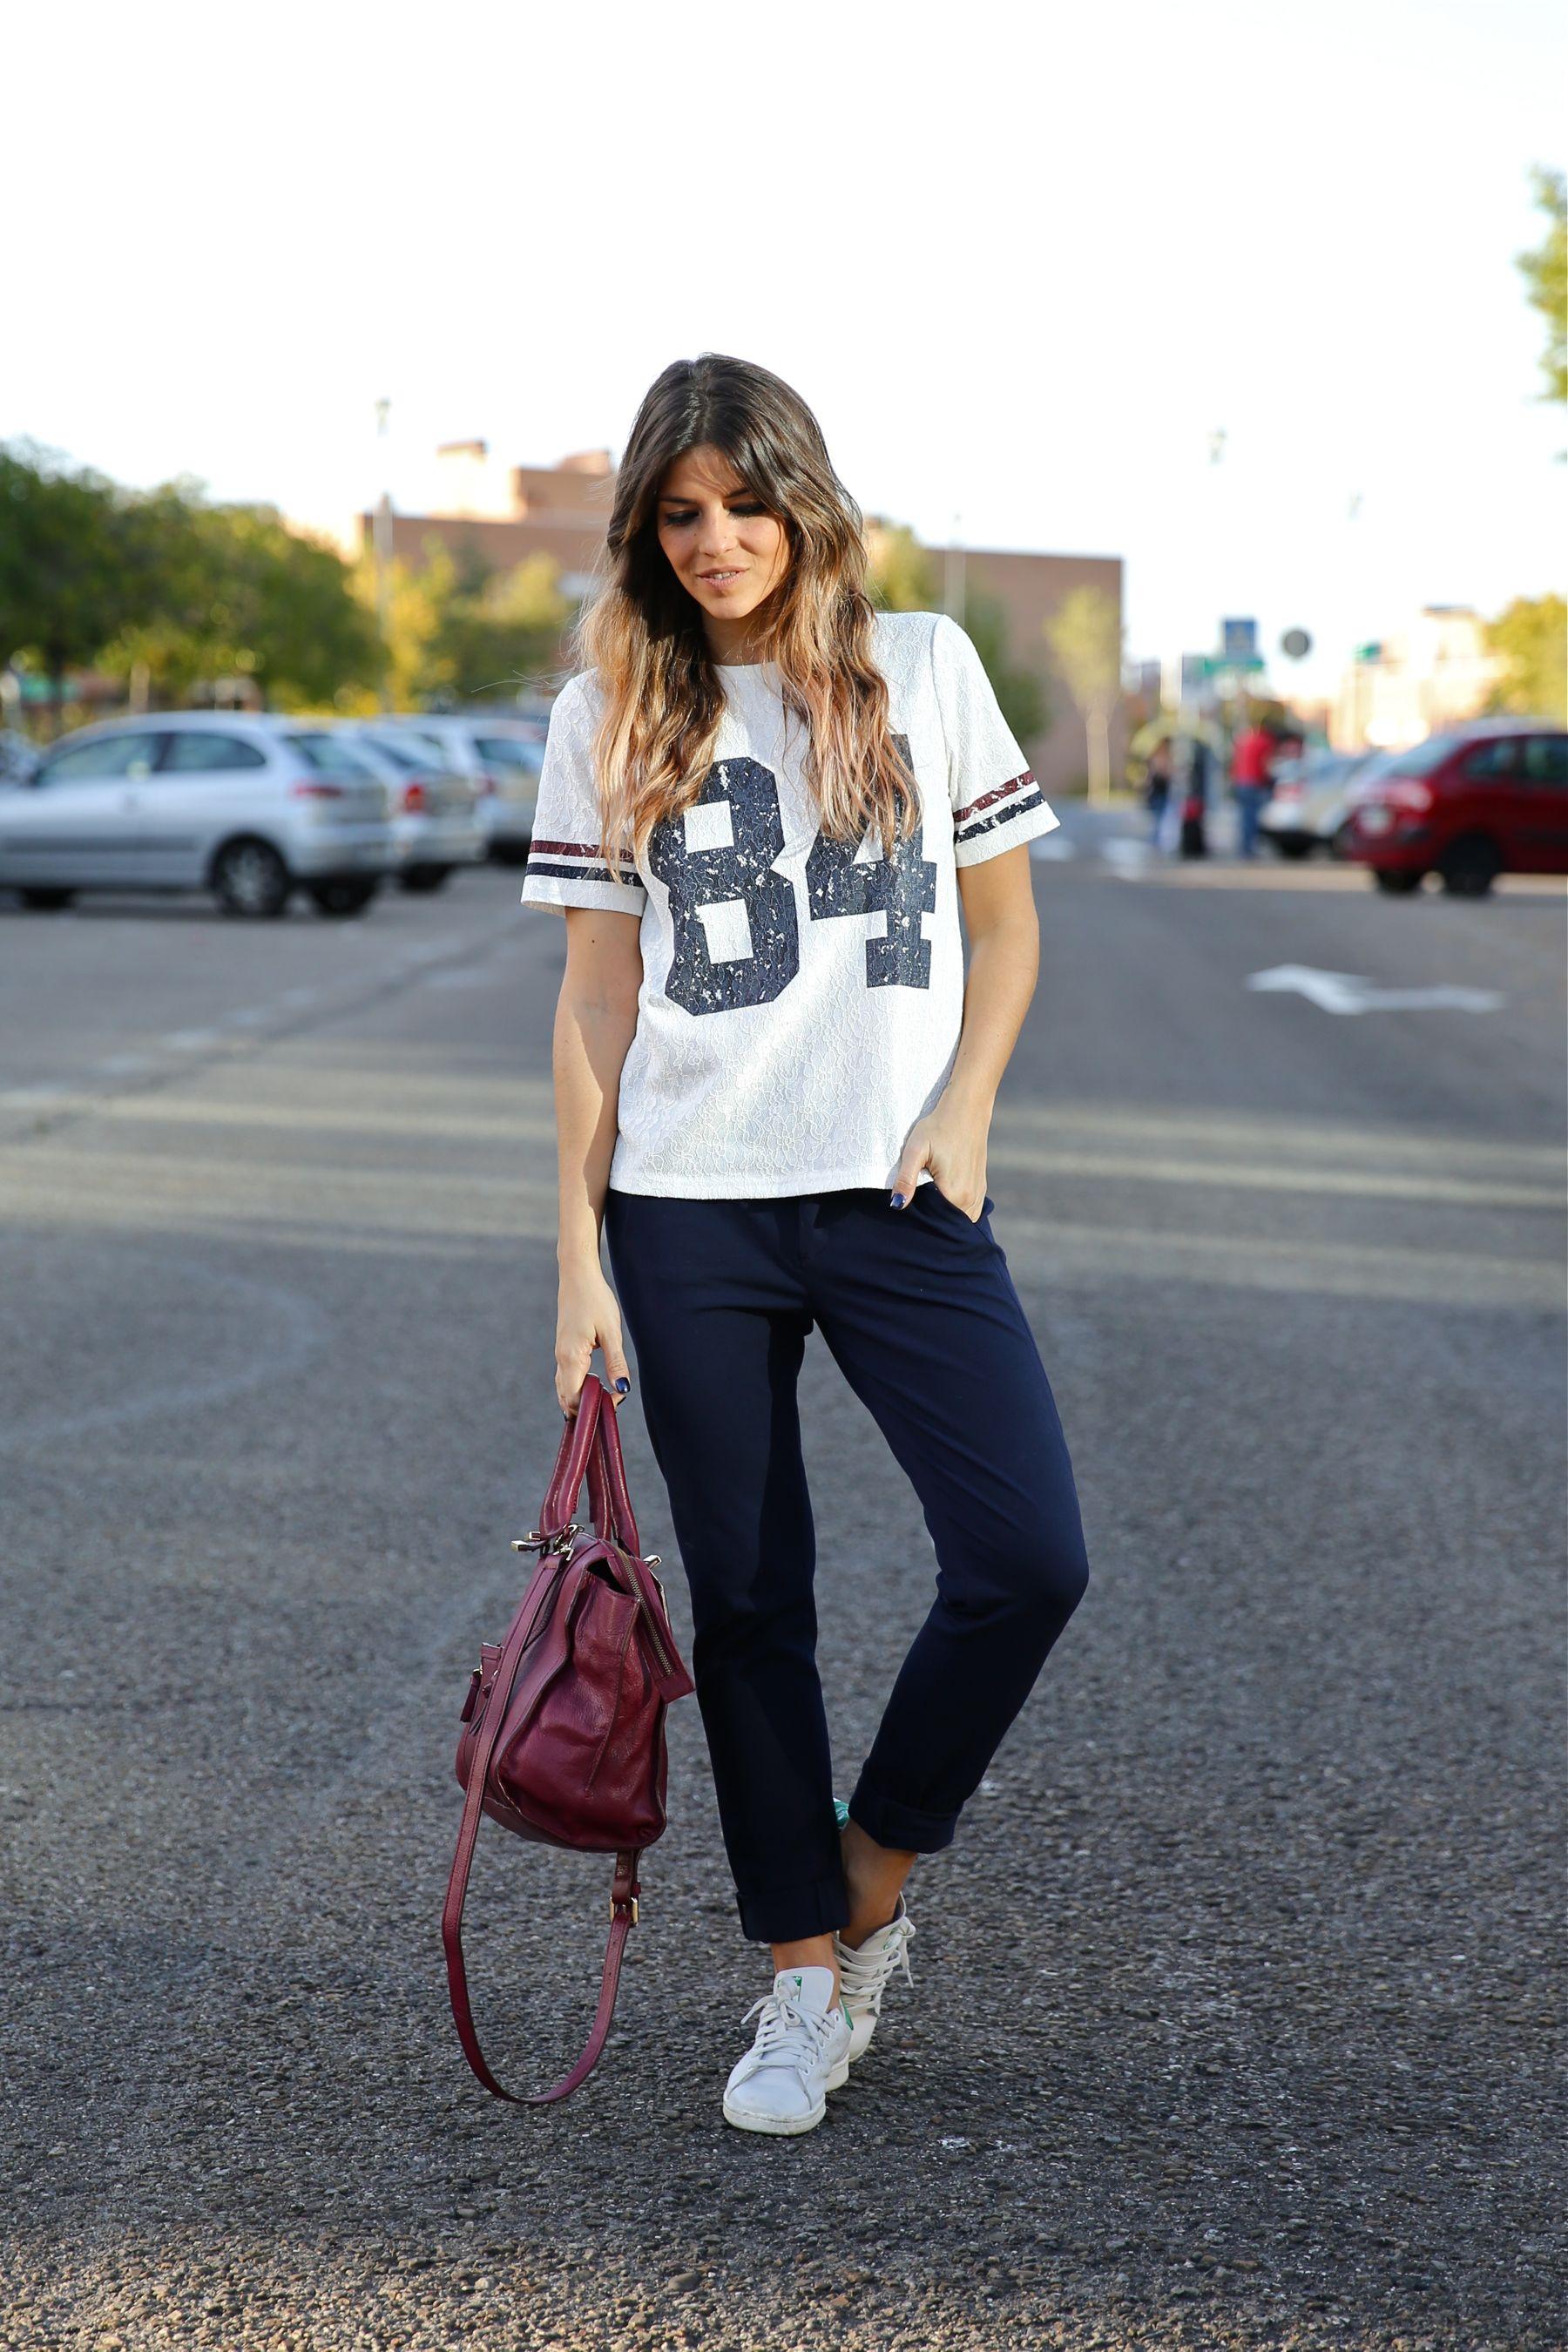 trendy_taste-look-outfit-street_style-ootd-blog-blogger-fashion_spain-moda_españa-zara-stan_smith-adidas-cosette-tee-baseball-camiseta-numero-pantalón-capri-pinzas-8